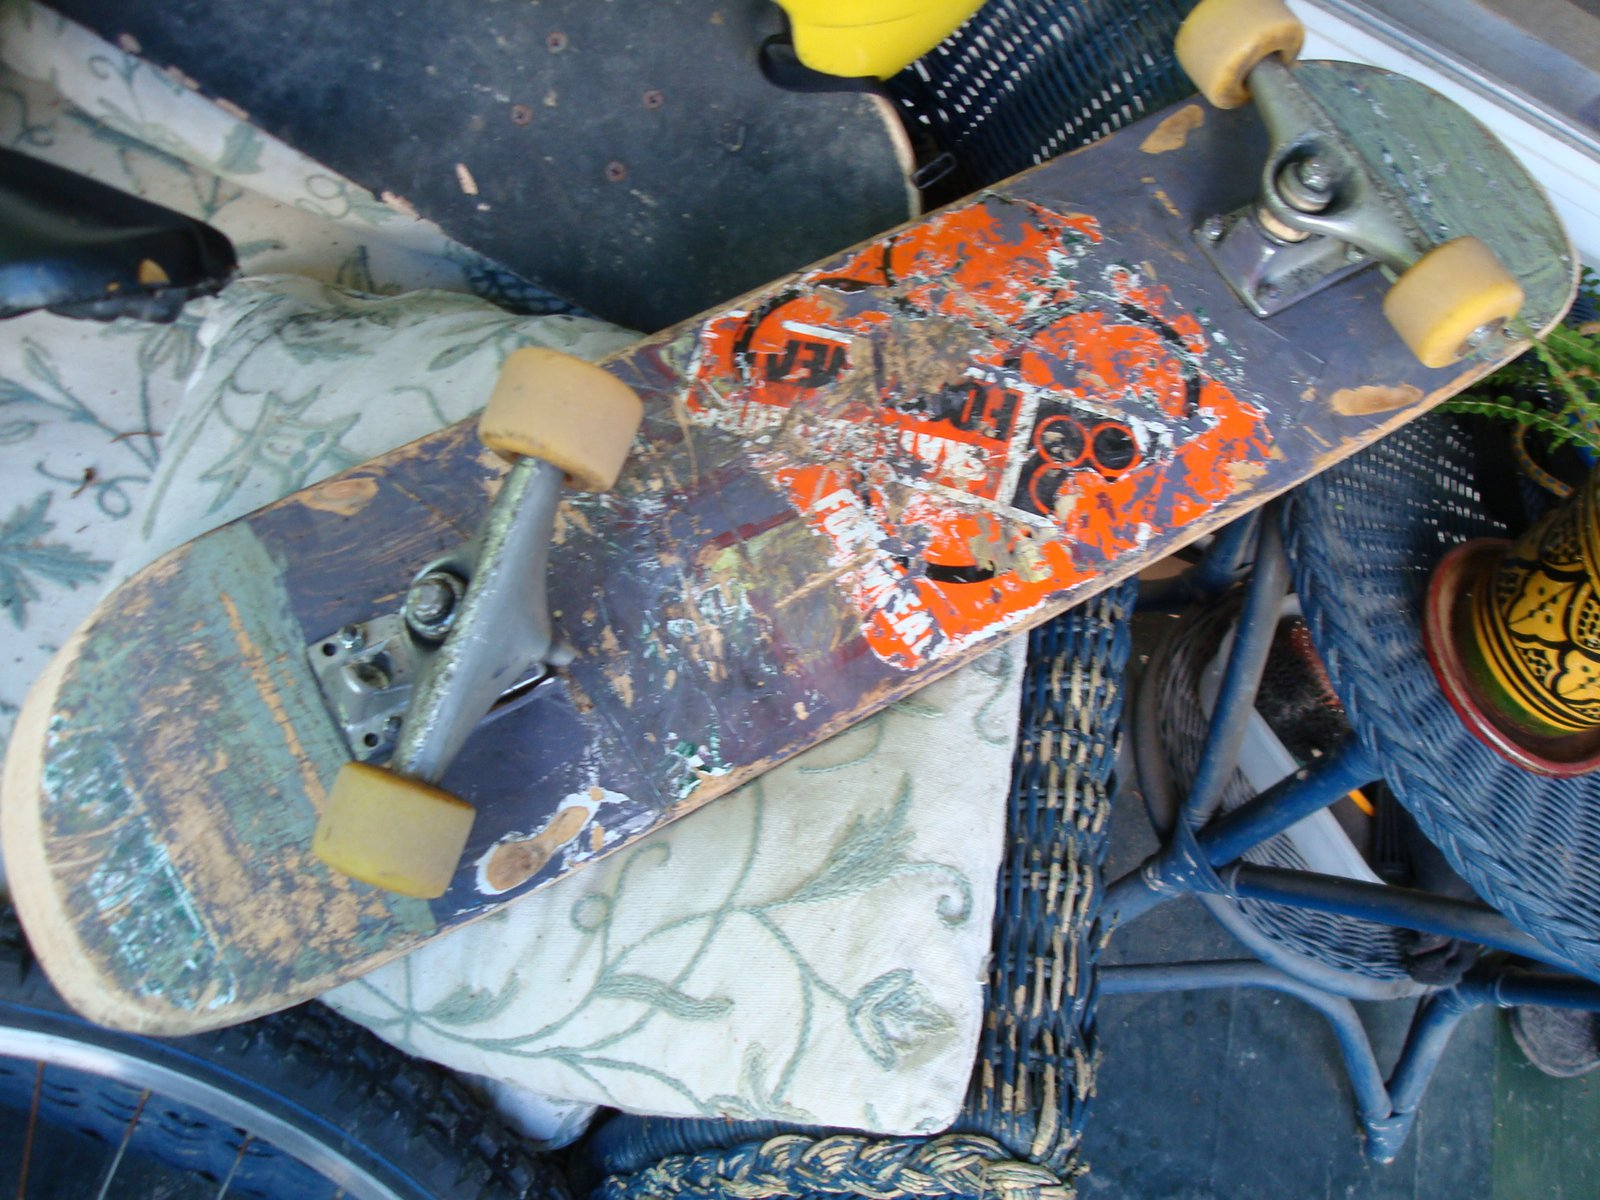 Broken skateboard truck